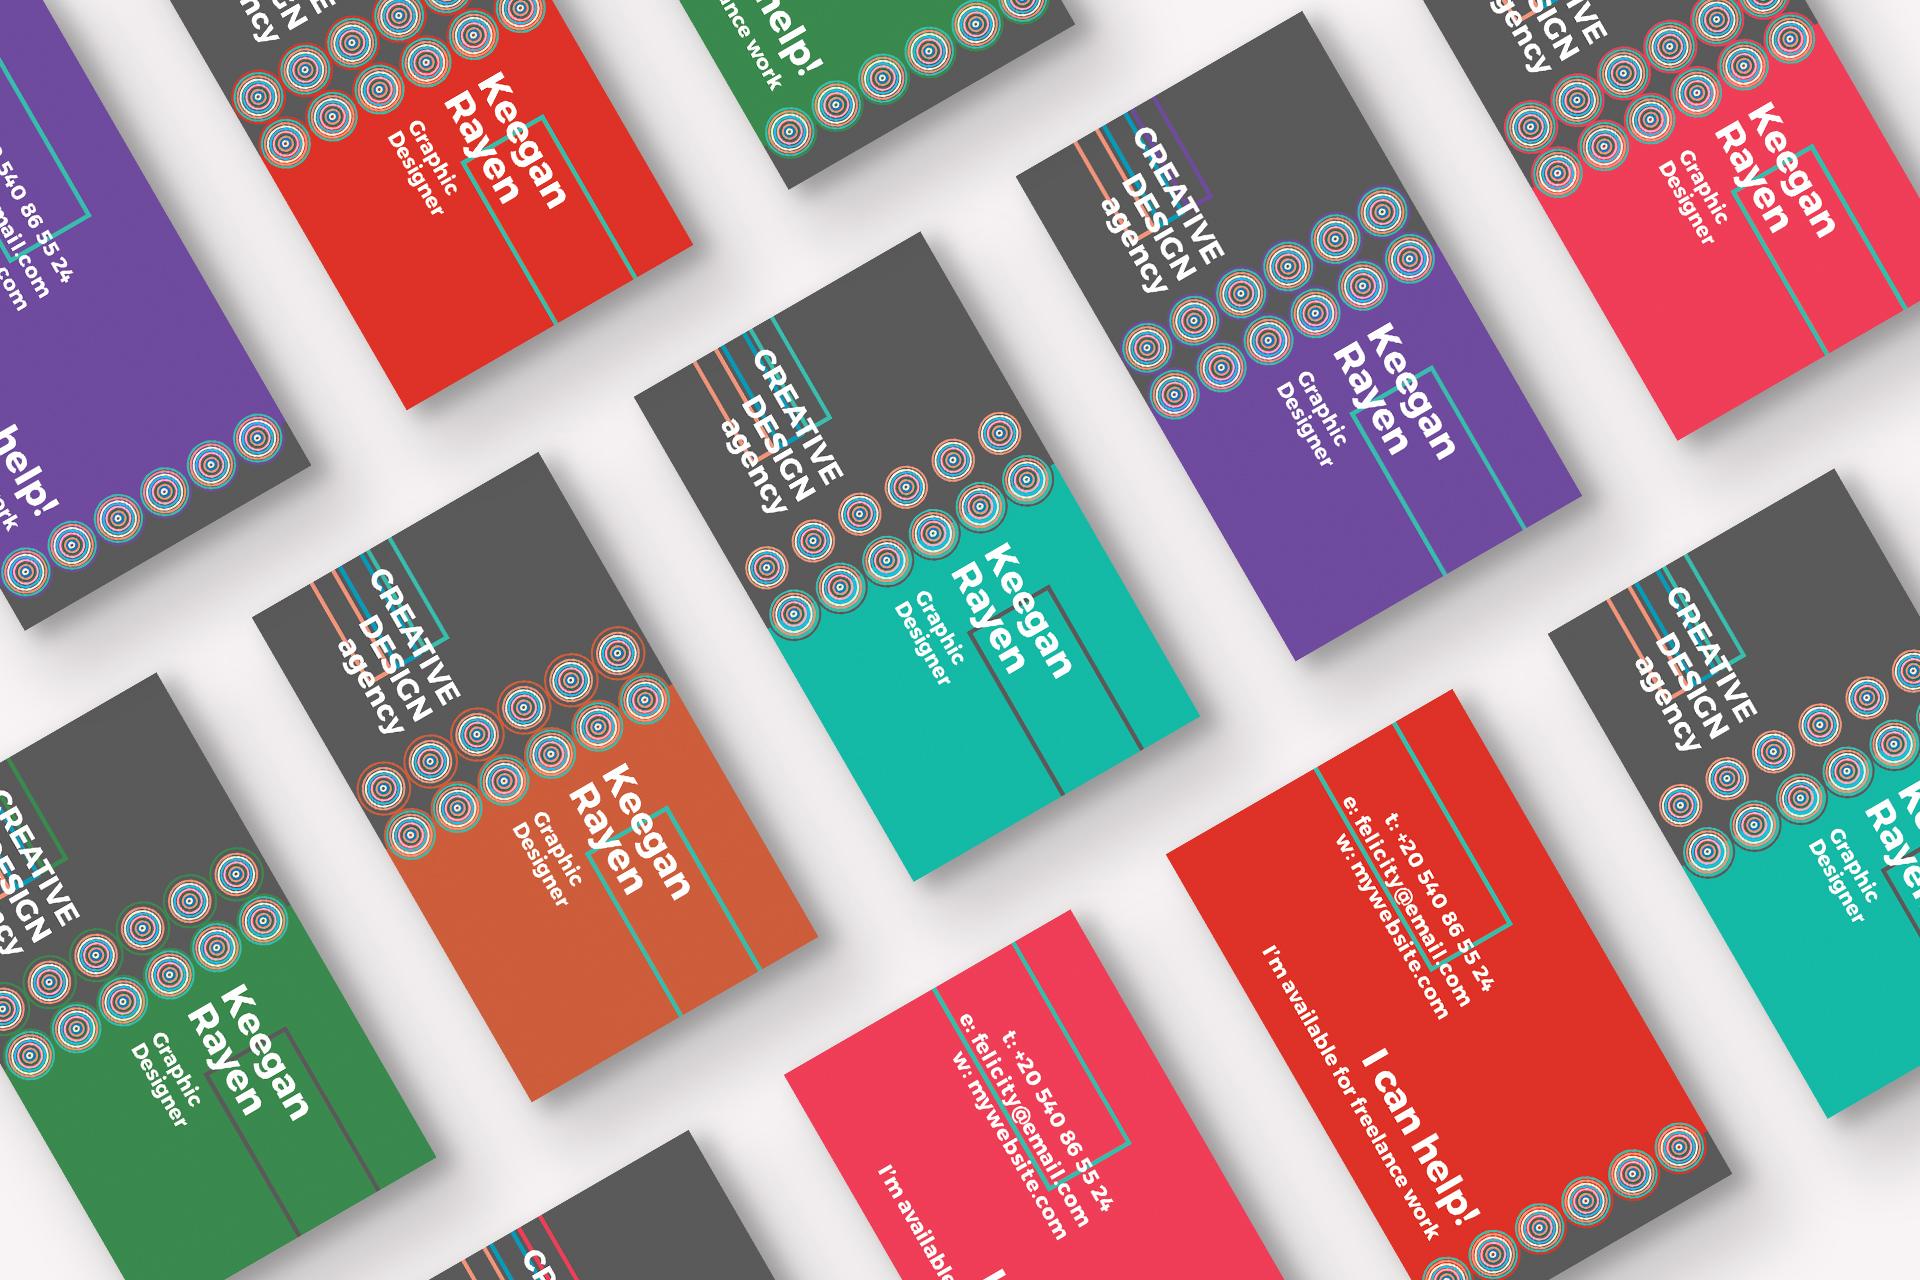 Creative design agency business card by design bundles creative design agency business card example image 1 colourmoves